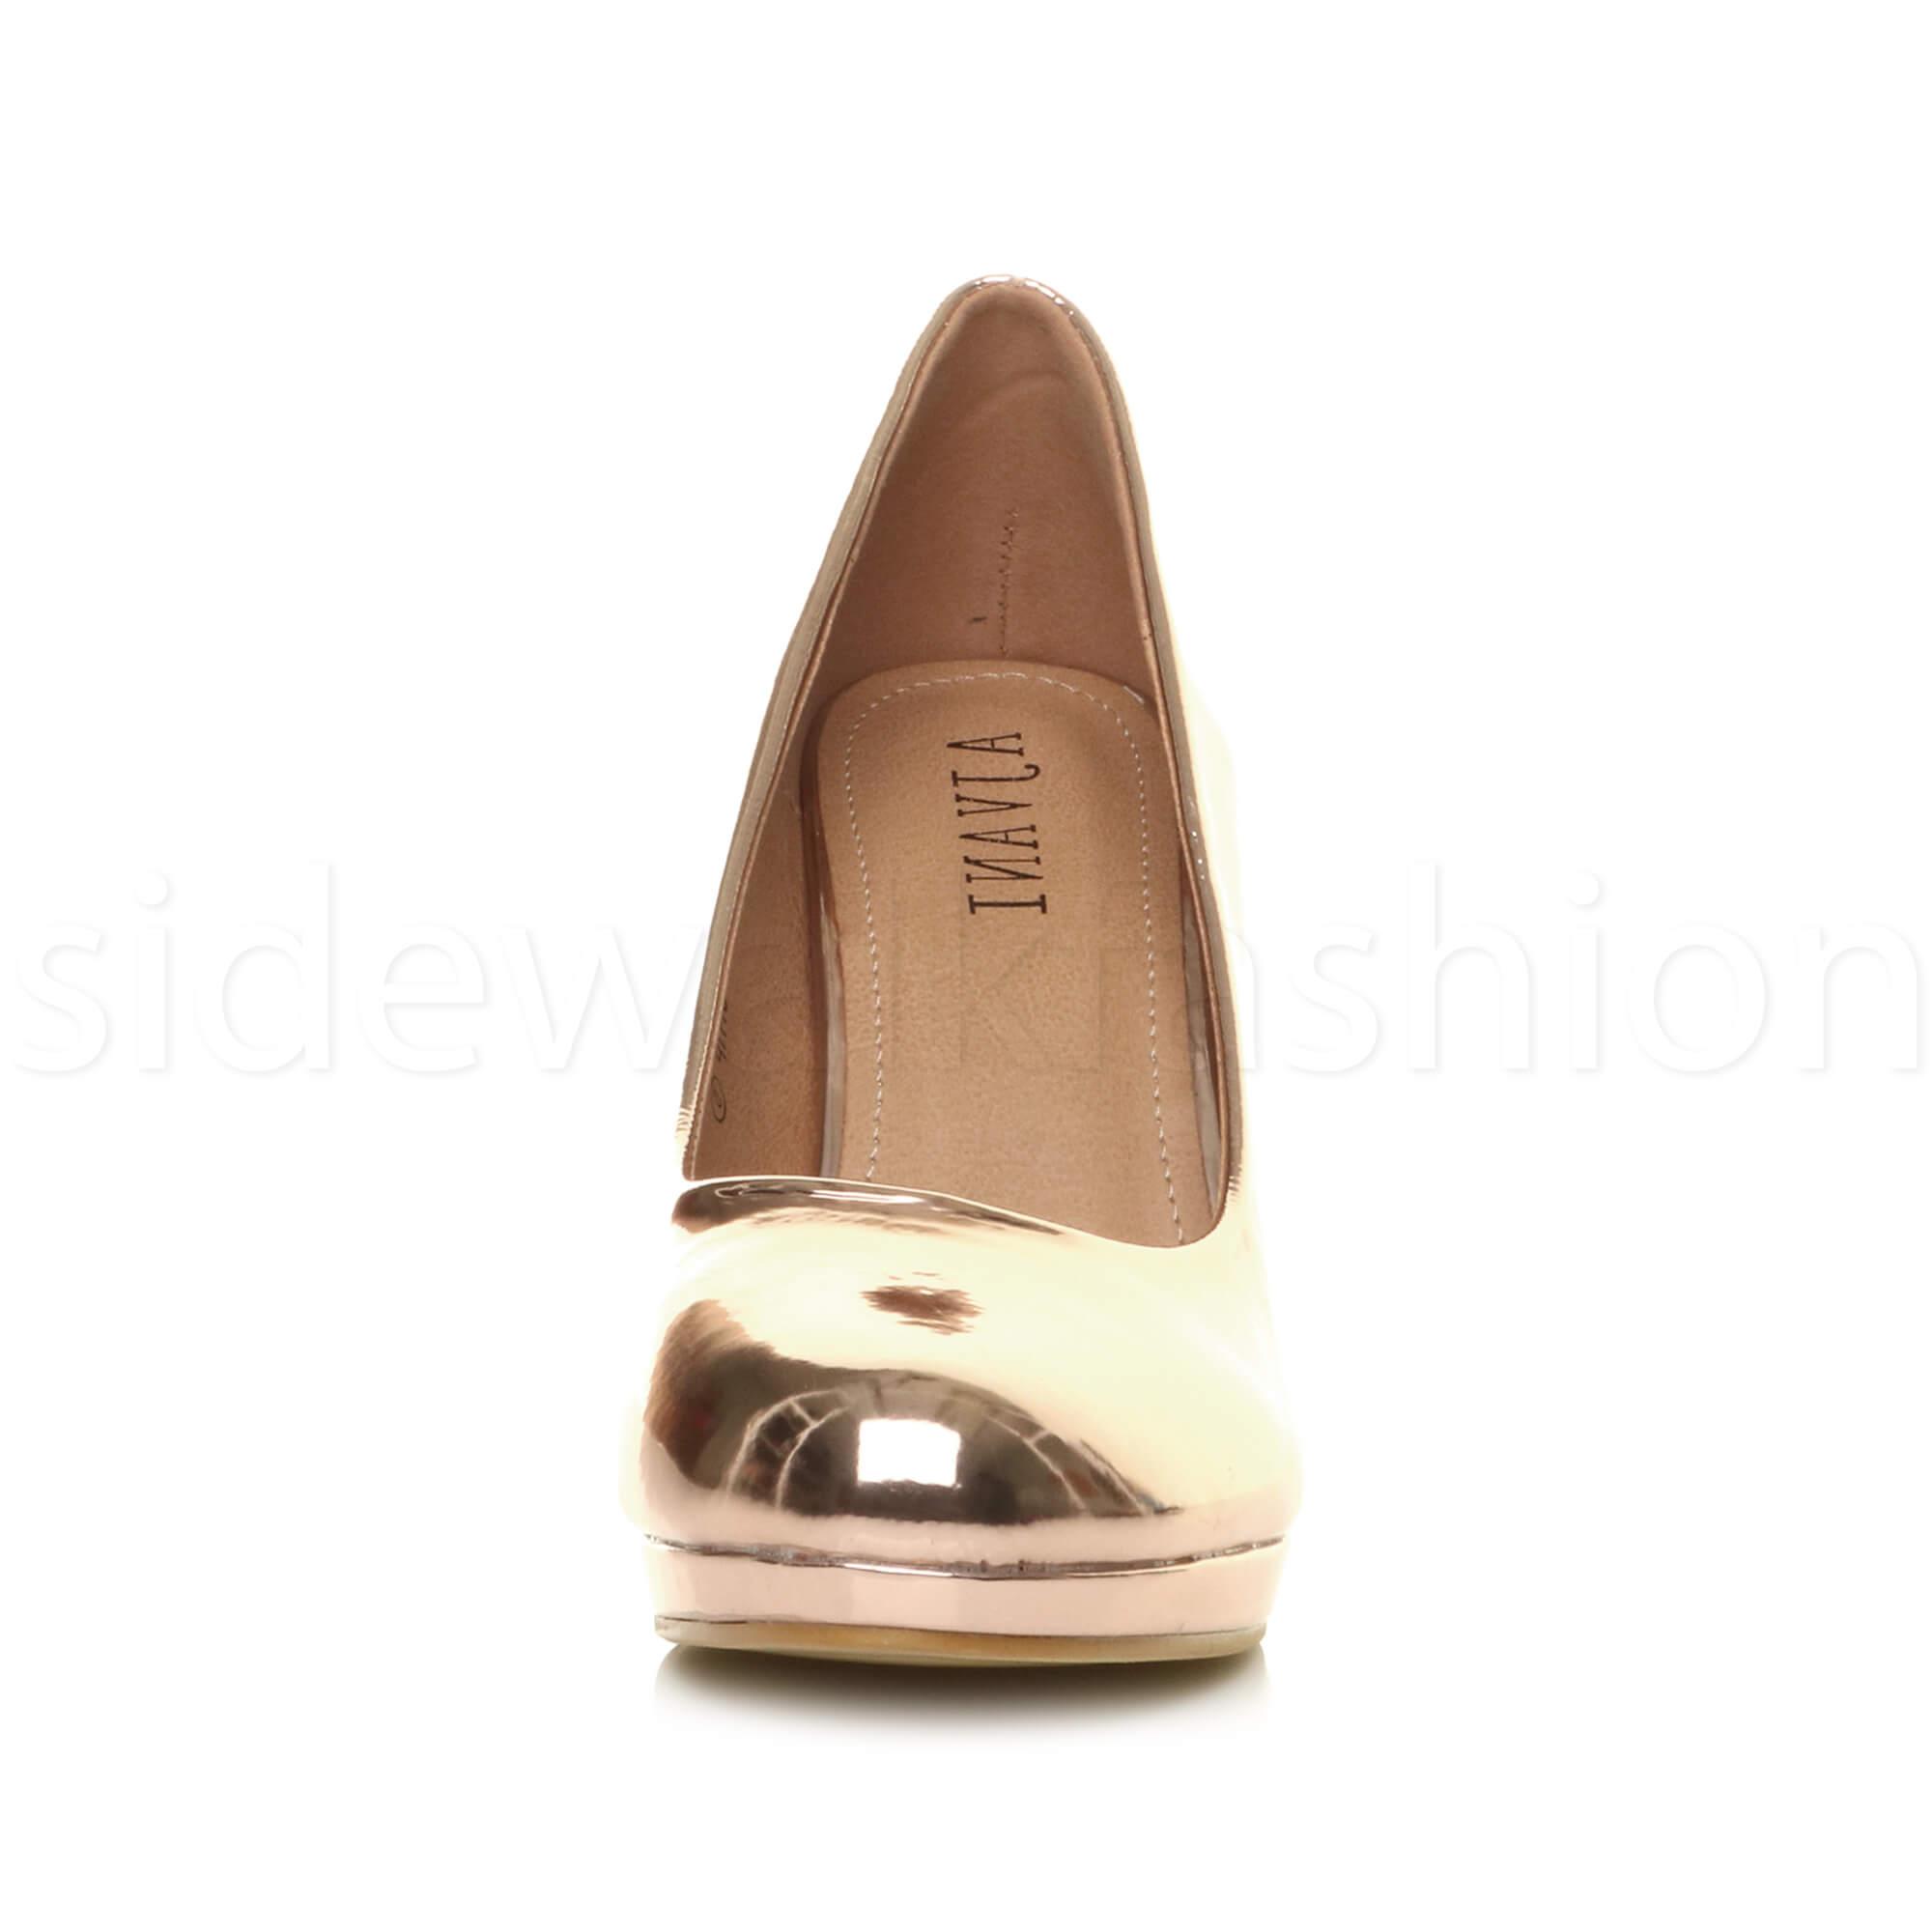 Womens-ladies-high-mid-heel-platform-wedding-evening-bridesmaid-court-shoes-size thumbnail 160